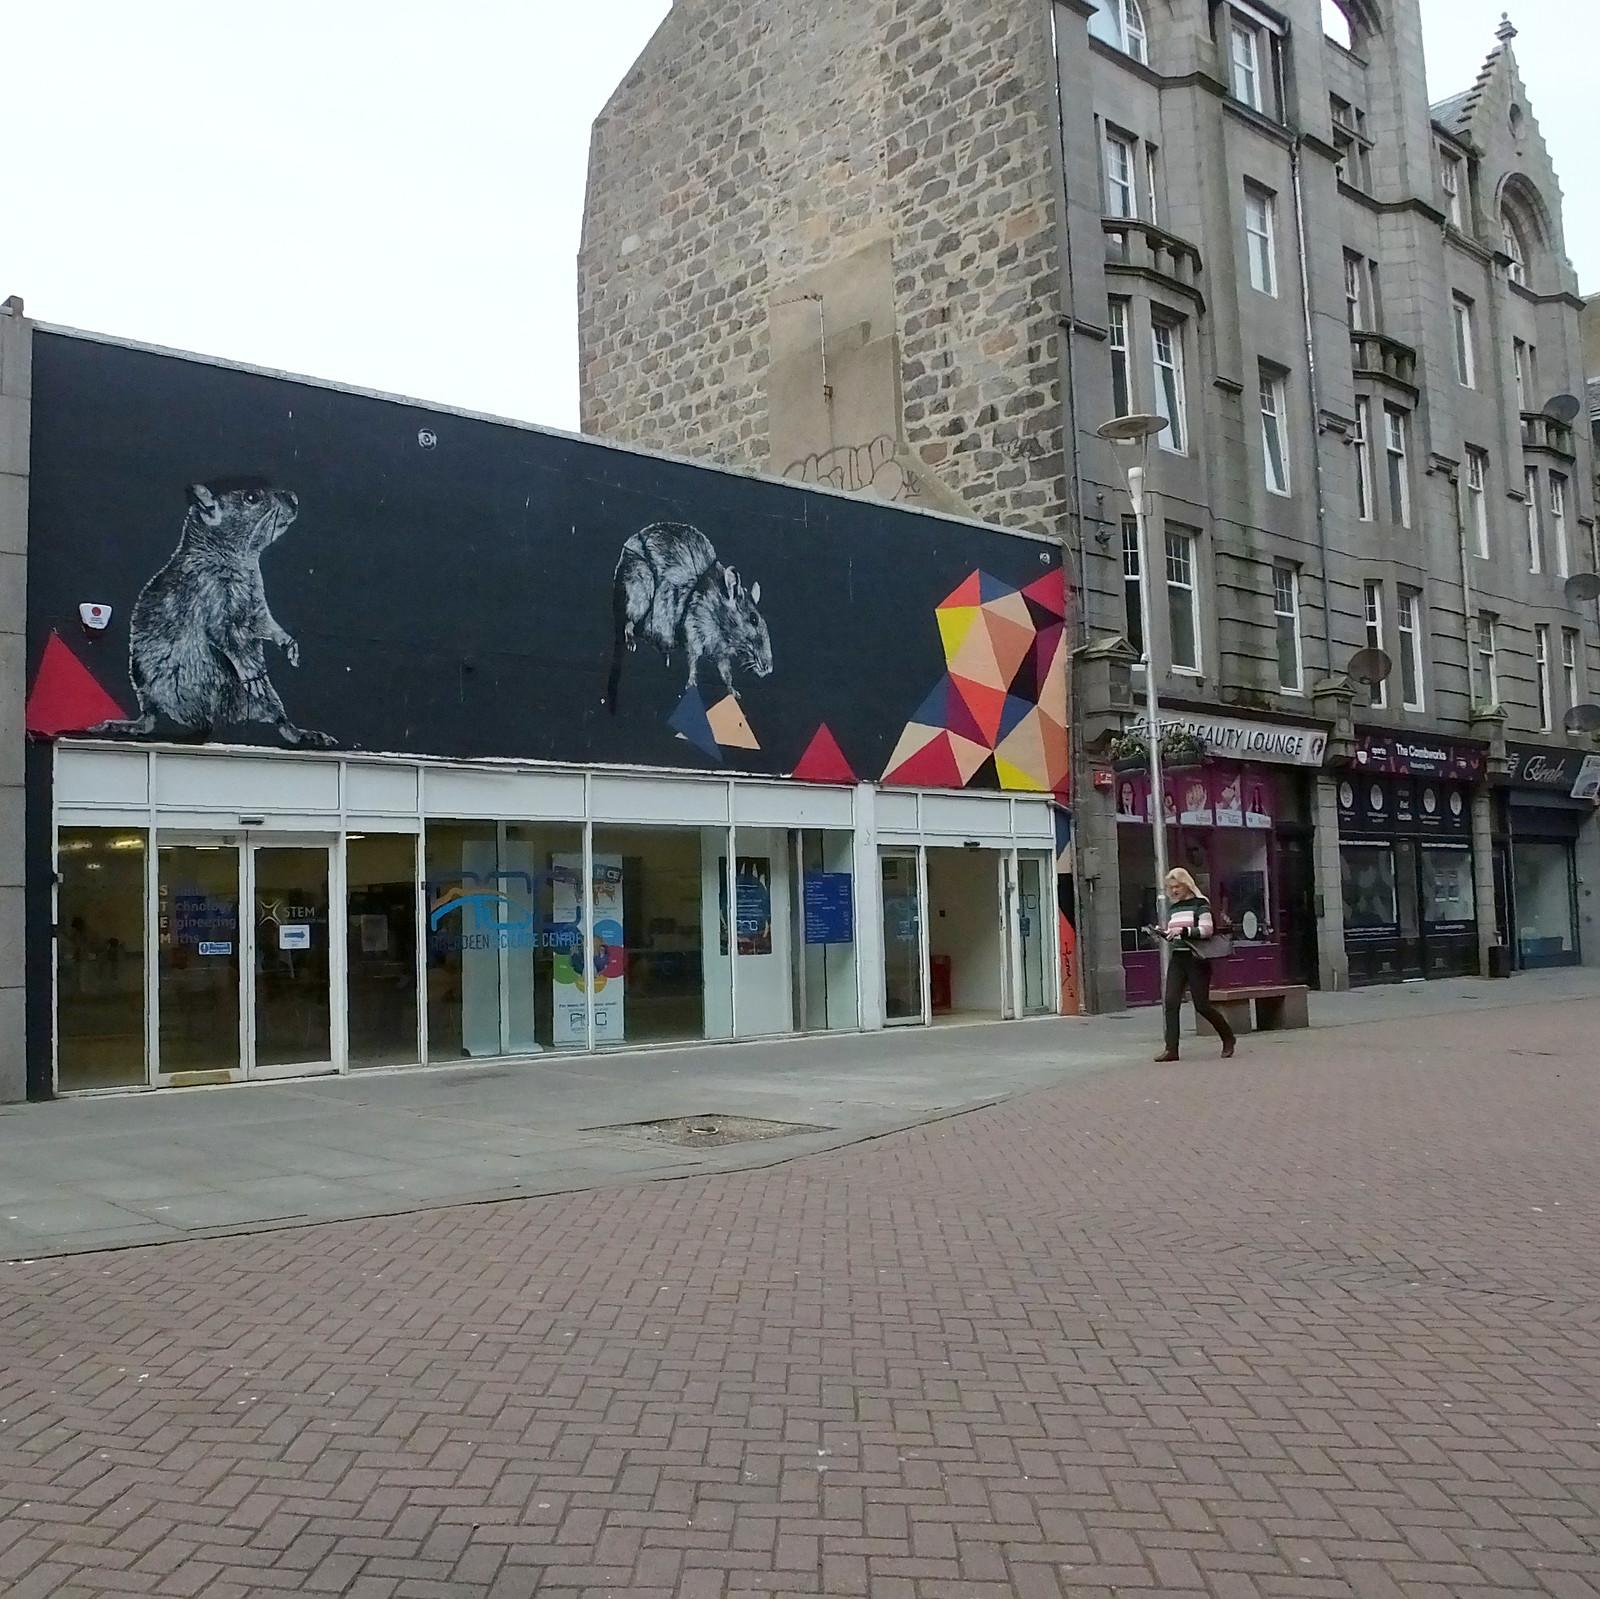 Nuart Aberdeen 2019: Hama Woods